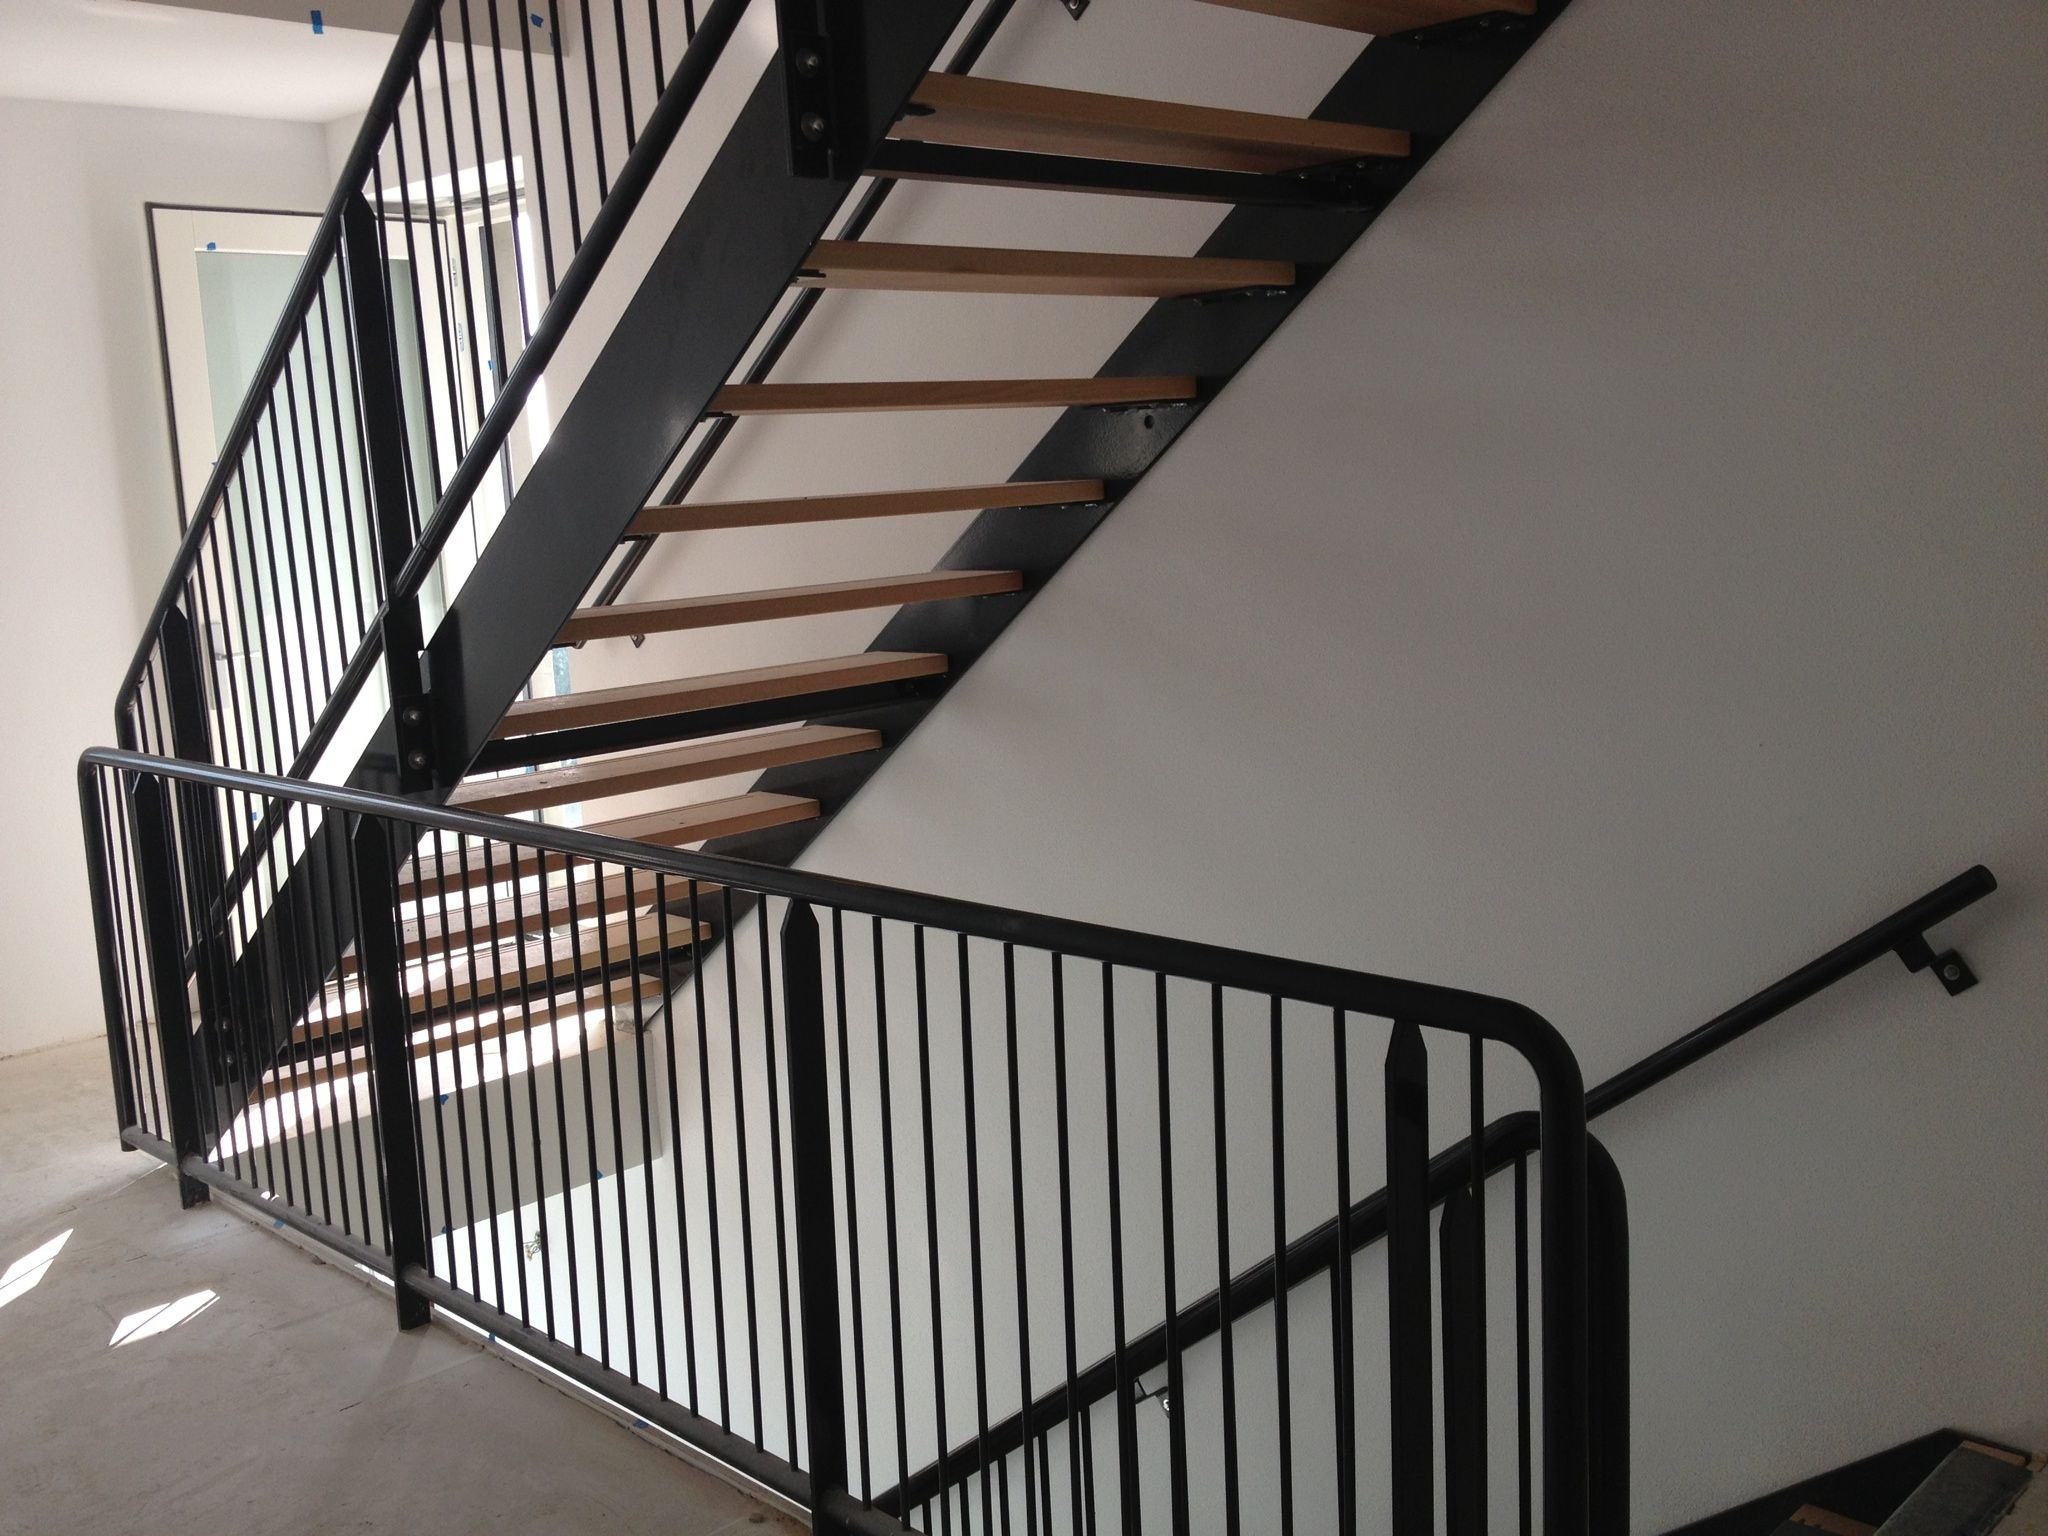 Stalen trap met houden treden en spijlen hekwerk for Stalen trap maken